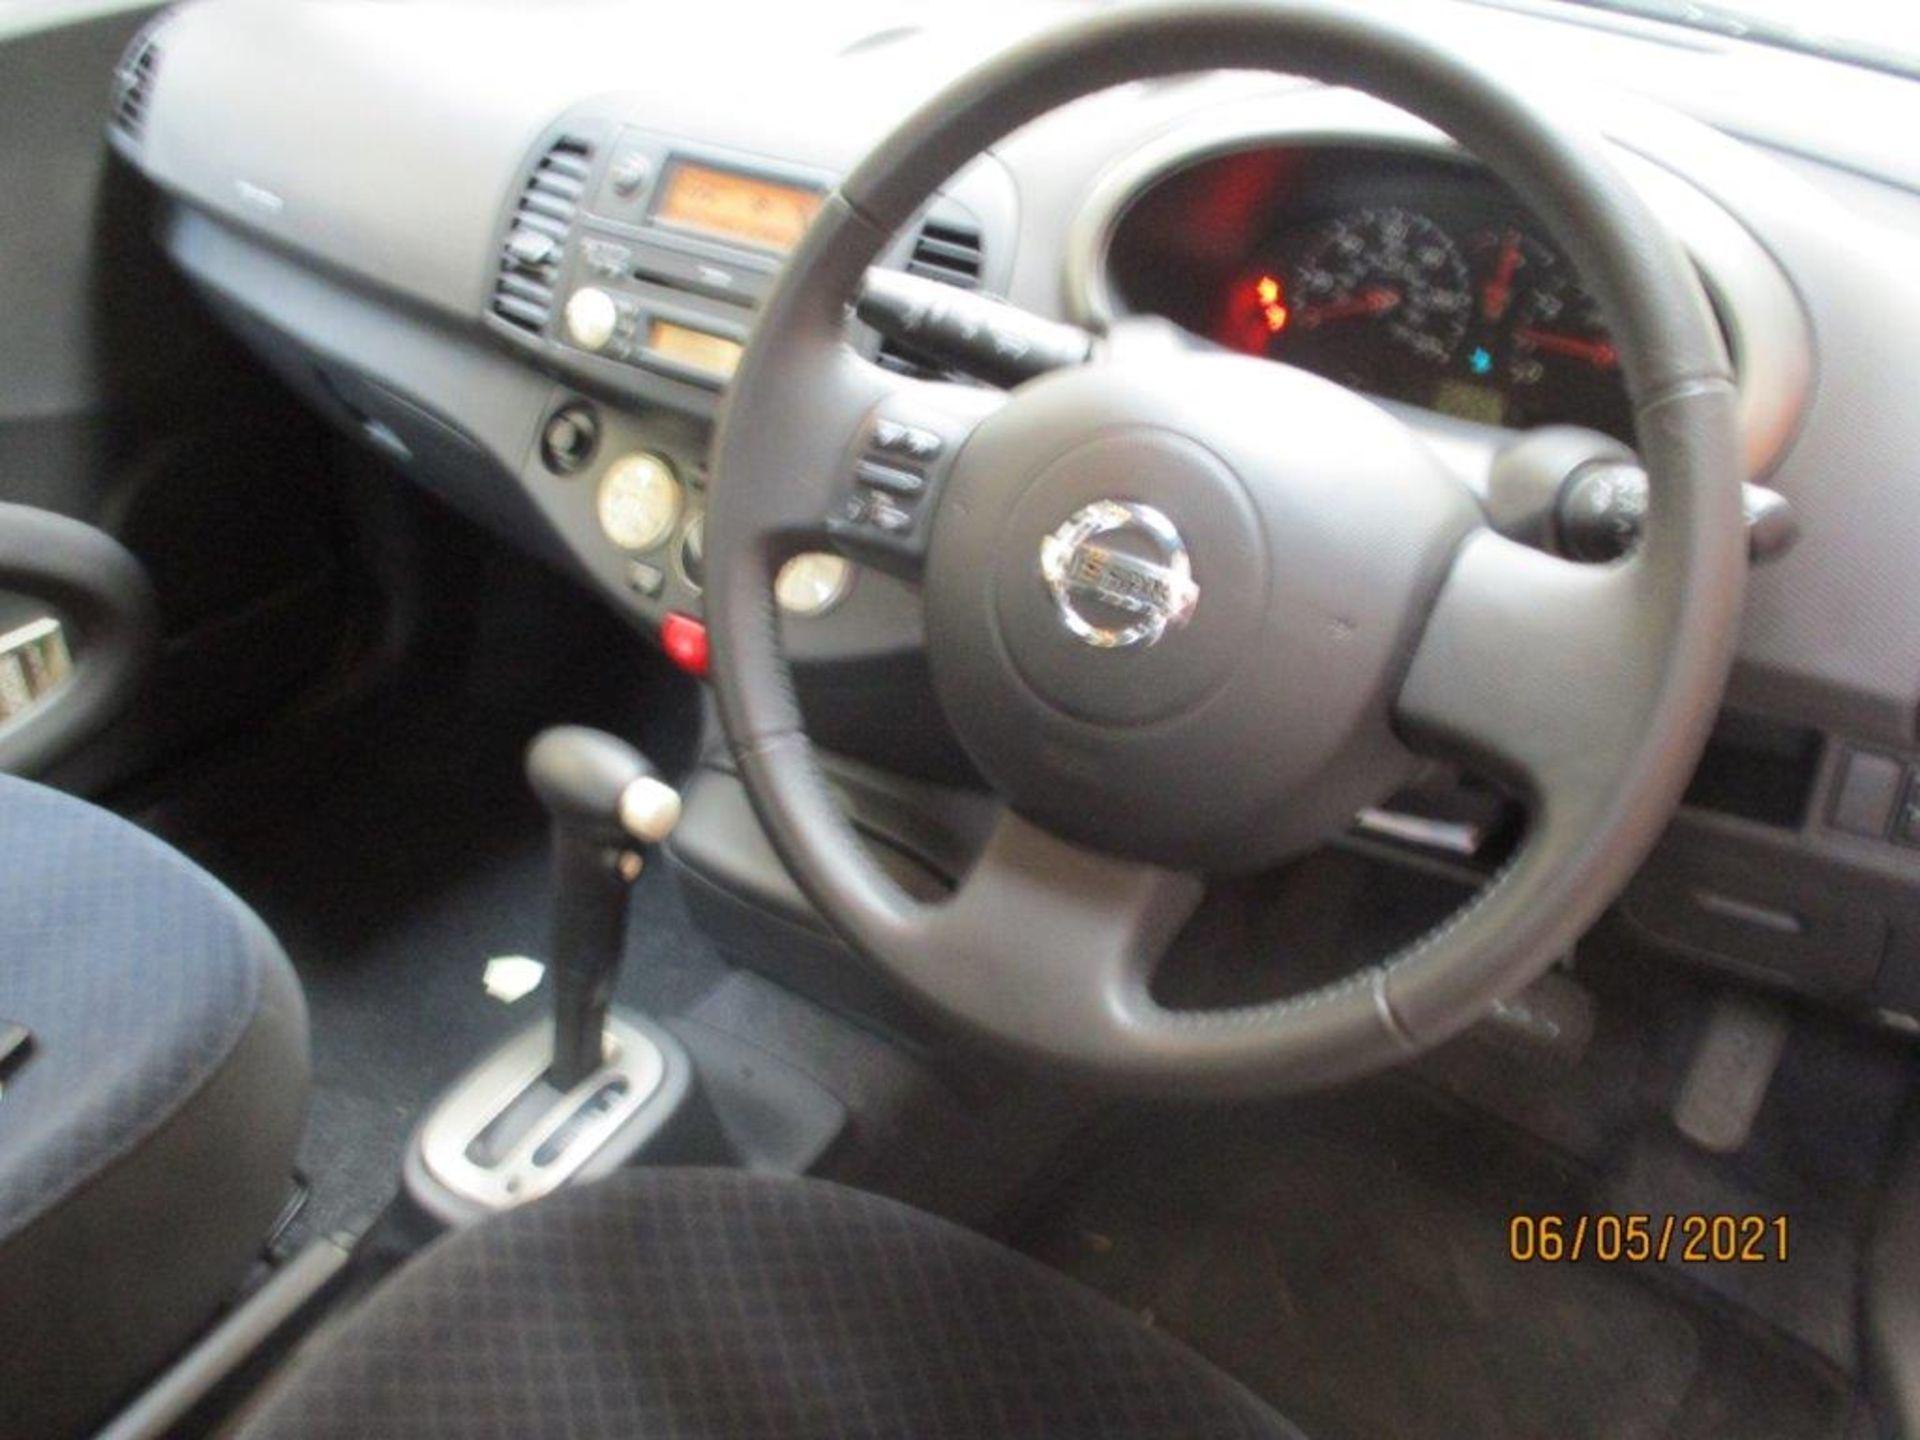 05 05 Nissan Micra SVE - Image 10 of 14